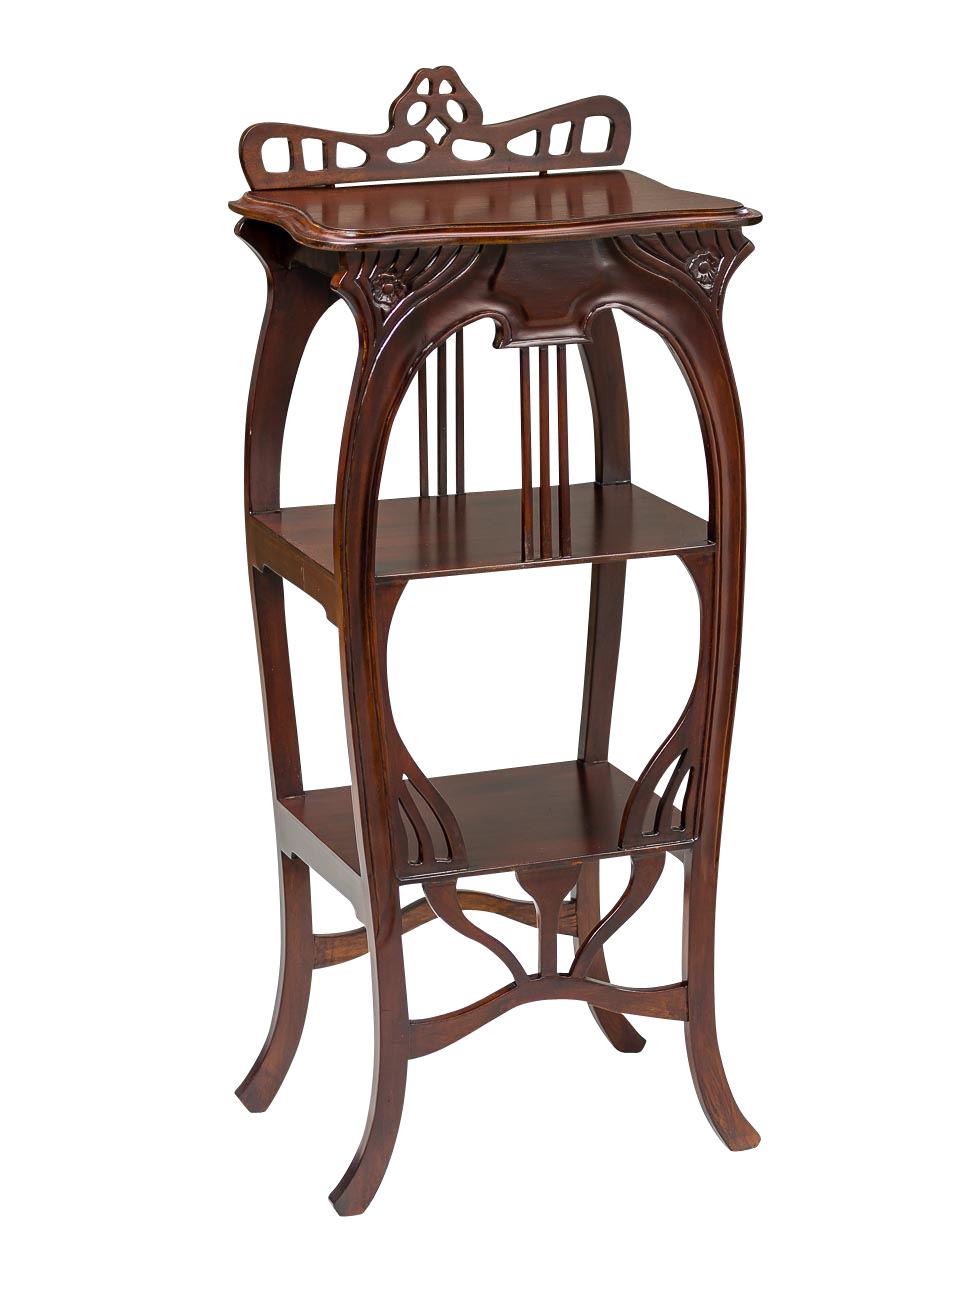 beistelltisch telefontisch regal bartisch tisch barregal holz antik stil aubaho. Black Bedroom Furniture Sets. Home Design Ideas